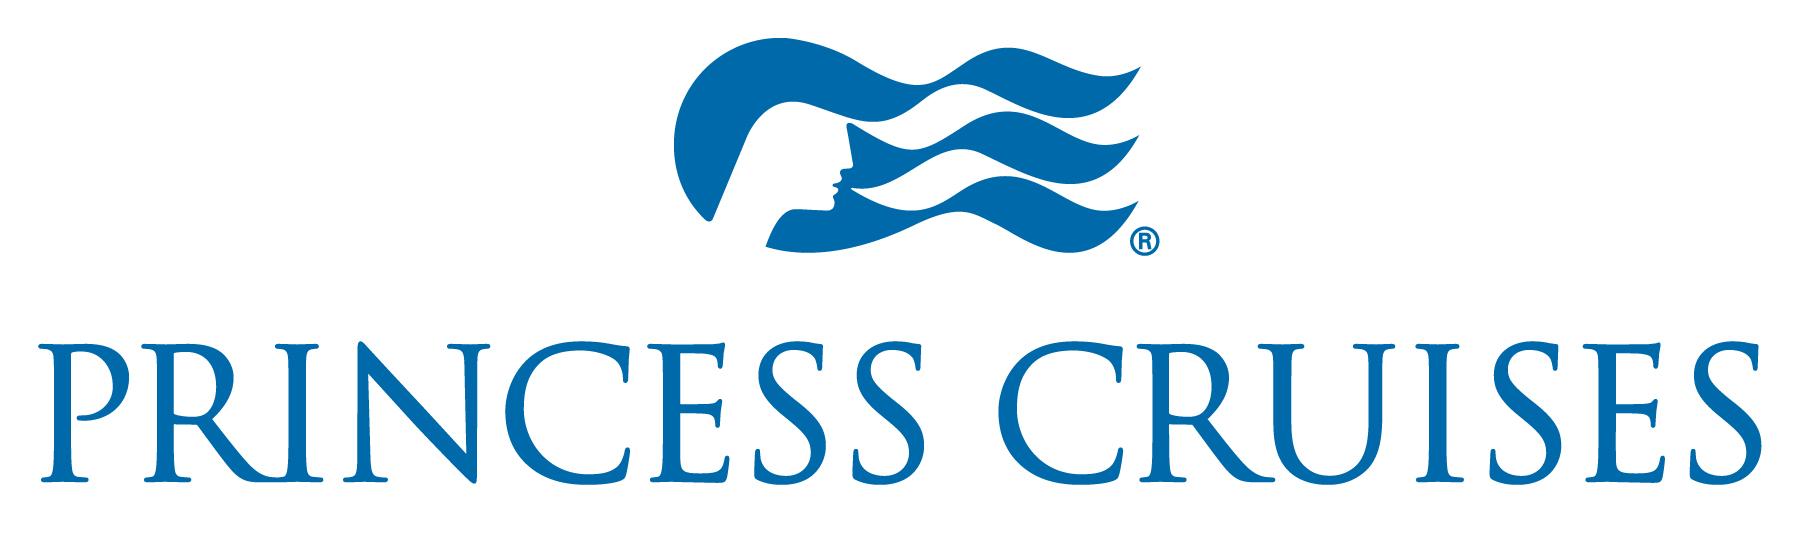 princess-cruises_1.jpg